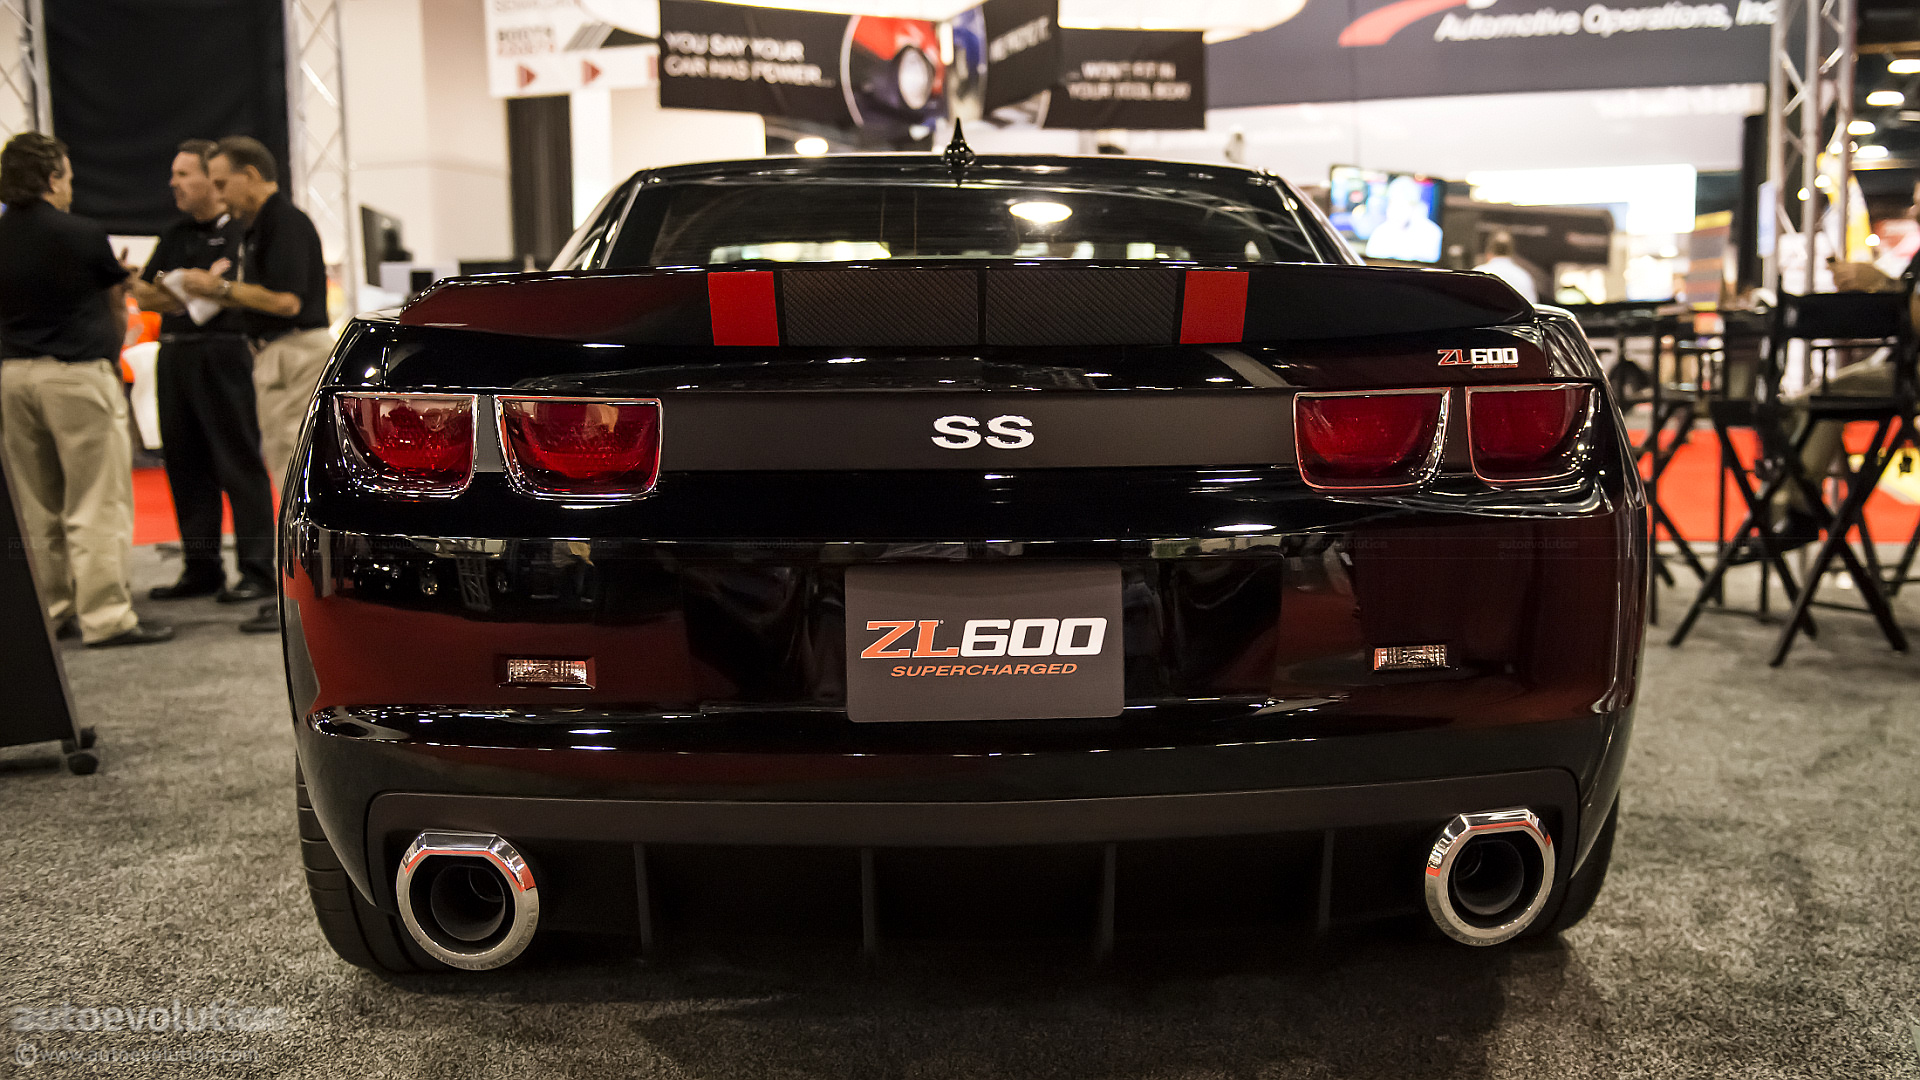 2012 SEMA 2013 ZL600 Supercharged Camaro Live Photos